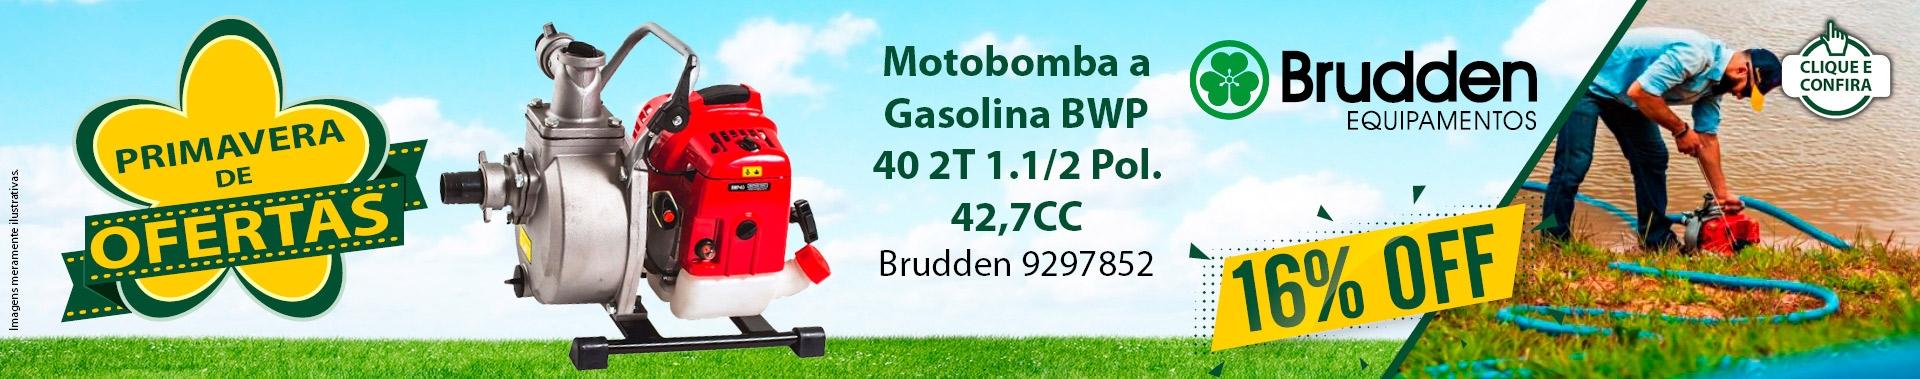 Super Oferta: Motobomba a Gasolina BWP 40 2T 1.1/2 Pol. 42,7CC BRUDDEN-9297852 16% OFF